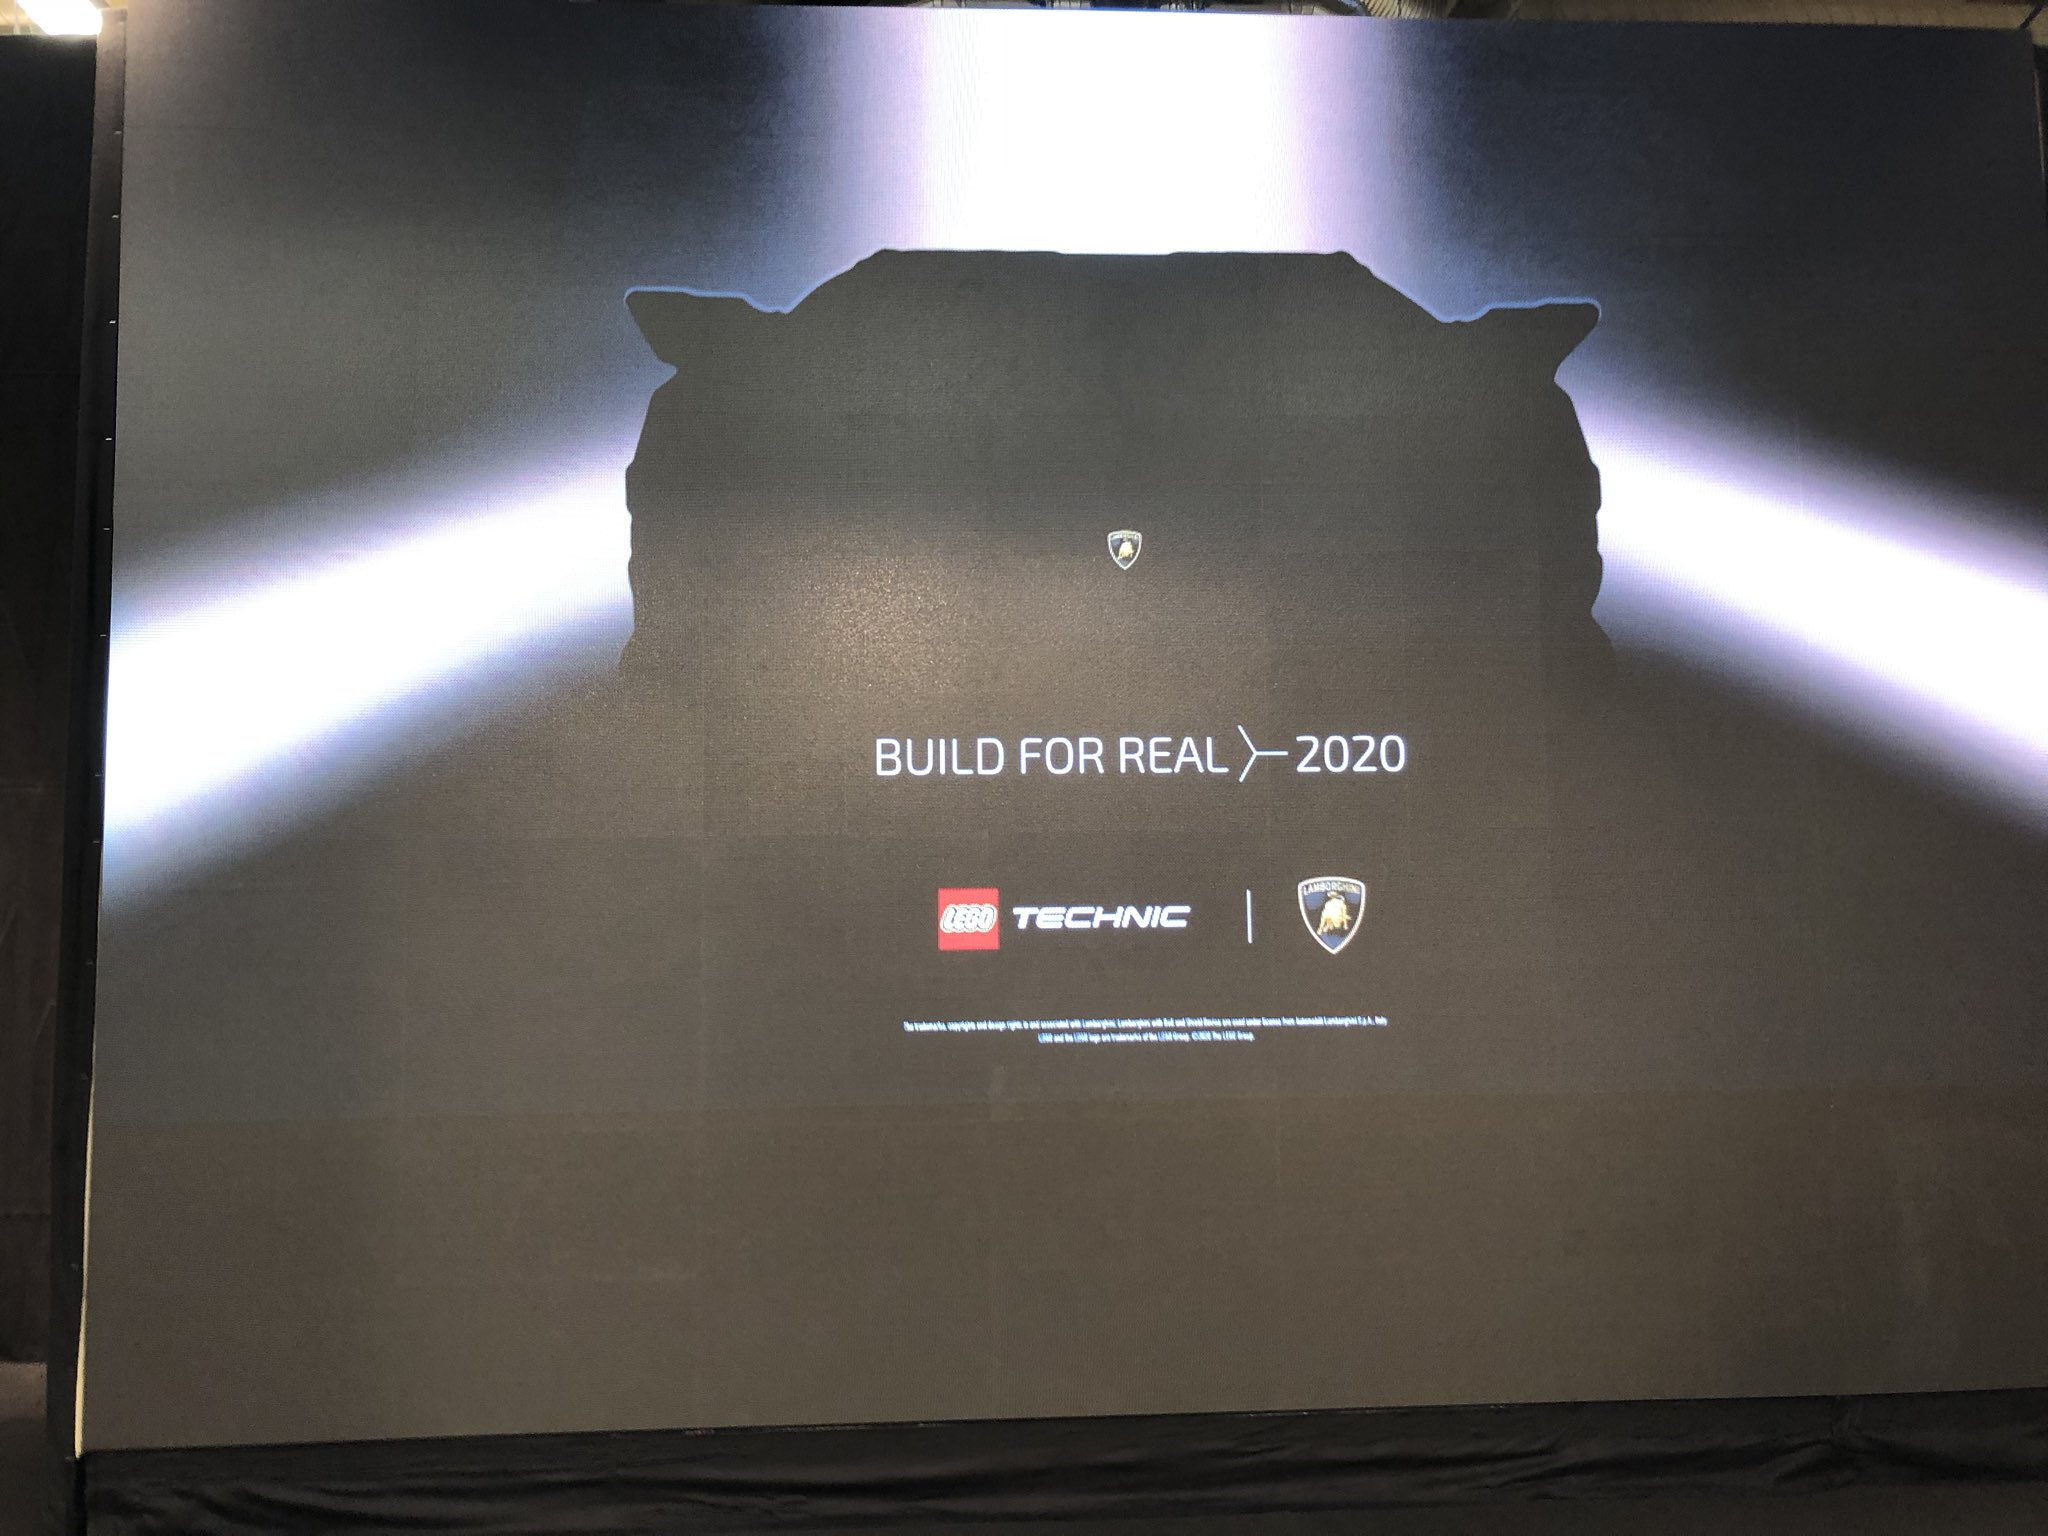 lamborghini-lego-pressekonferenz-2020-zusammengebaut-matthias-kuhnt zusammengebaut.com